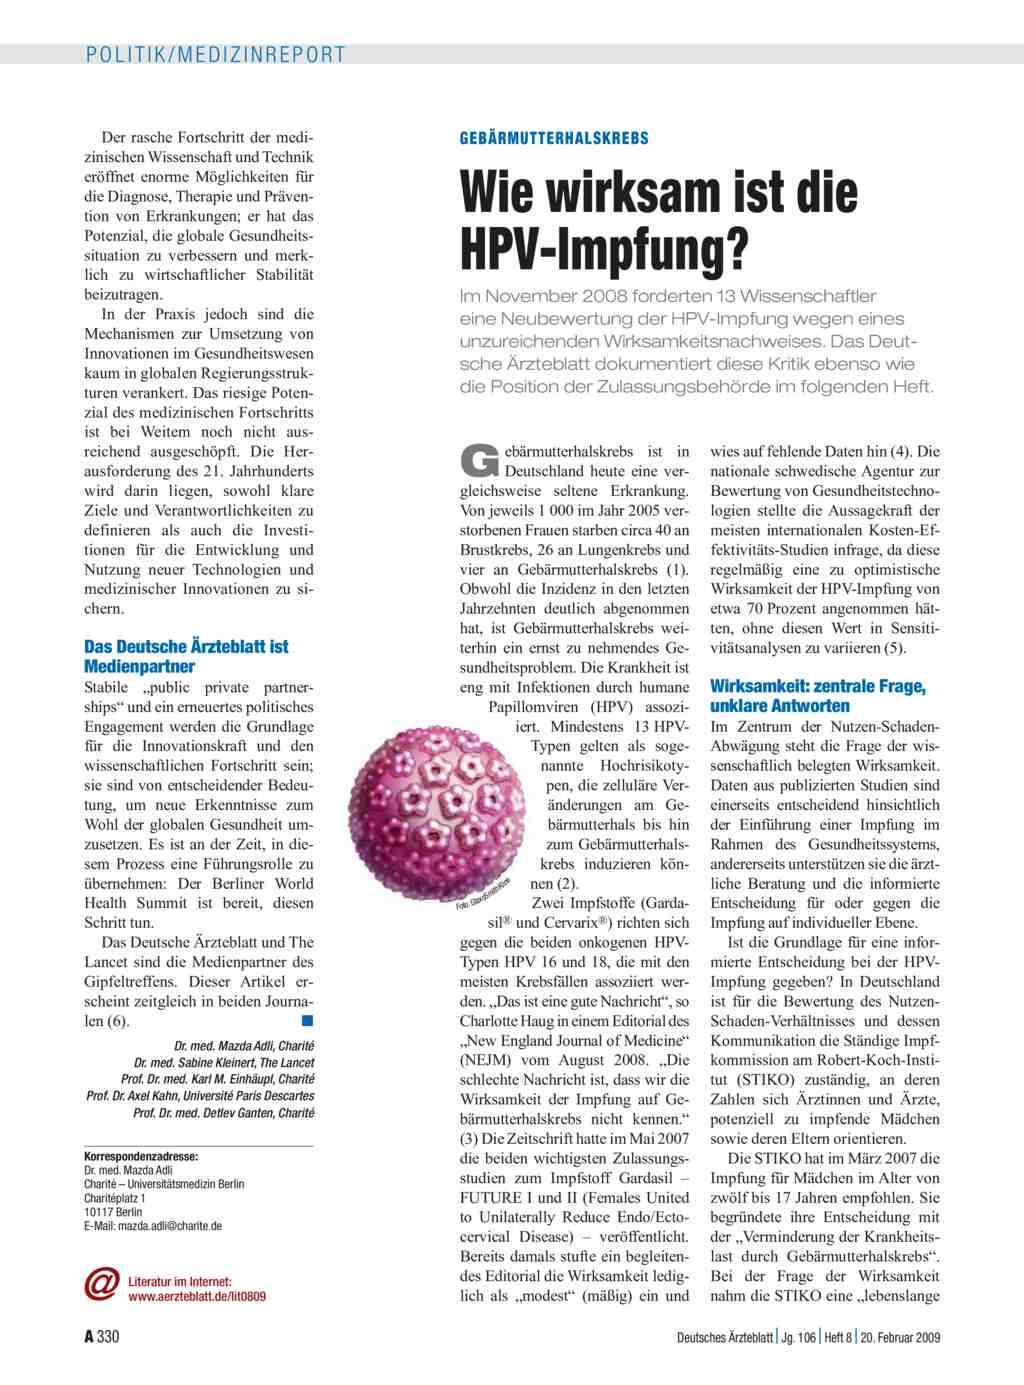 hpv impfung studien